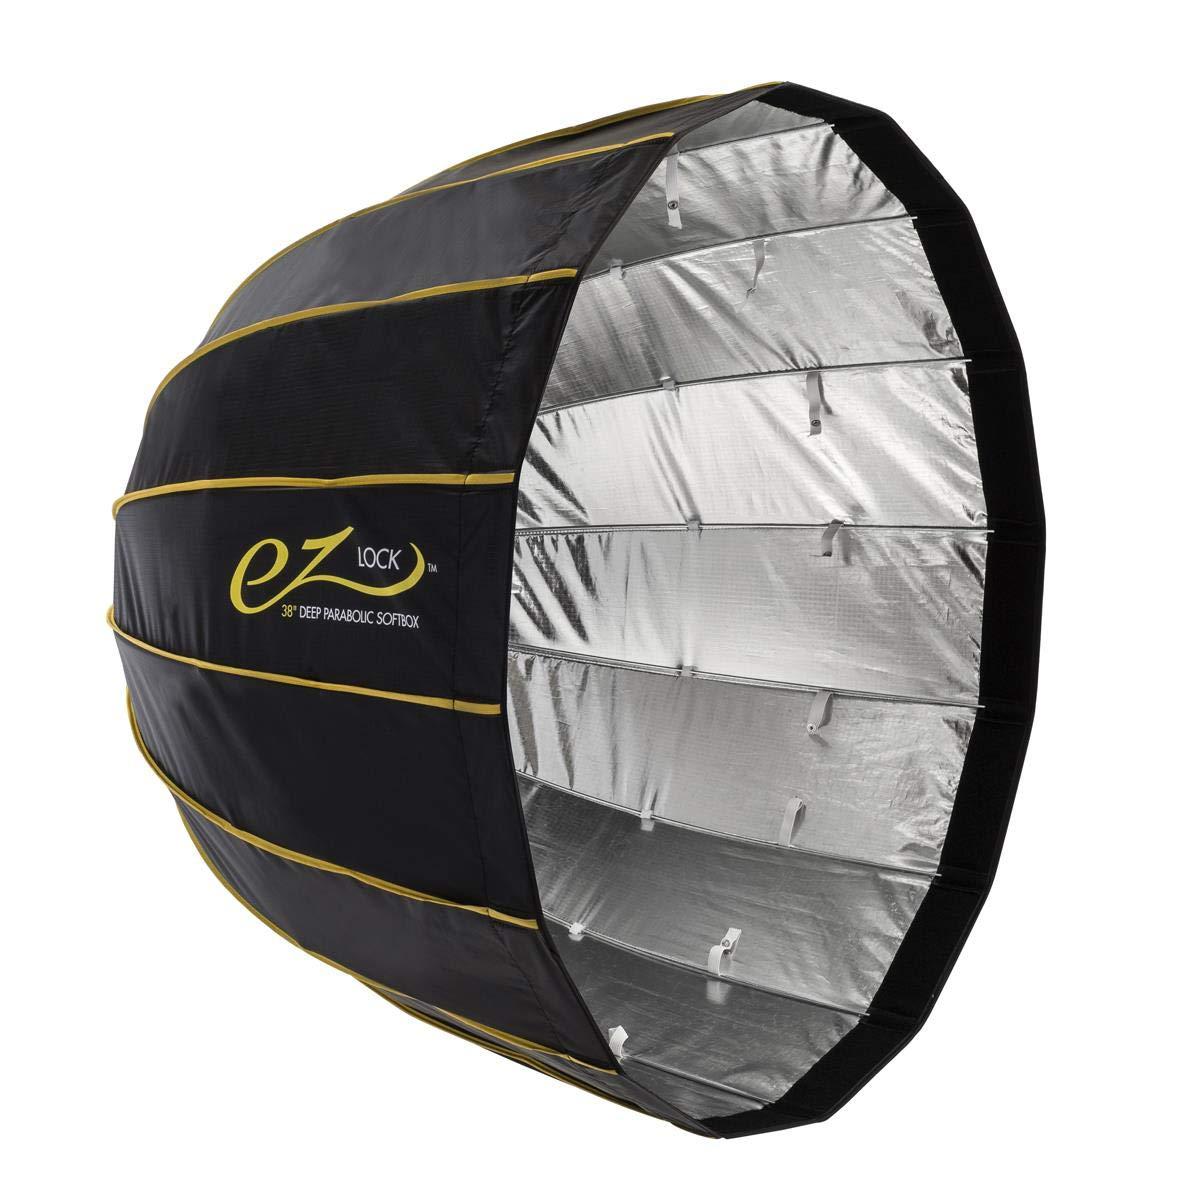 Glow EZ Lock Deep Parabolic Quick Softbox (38'')